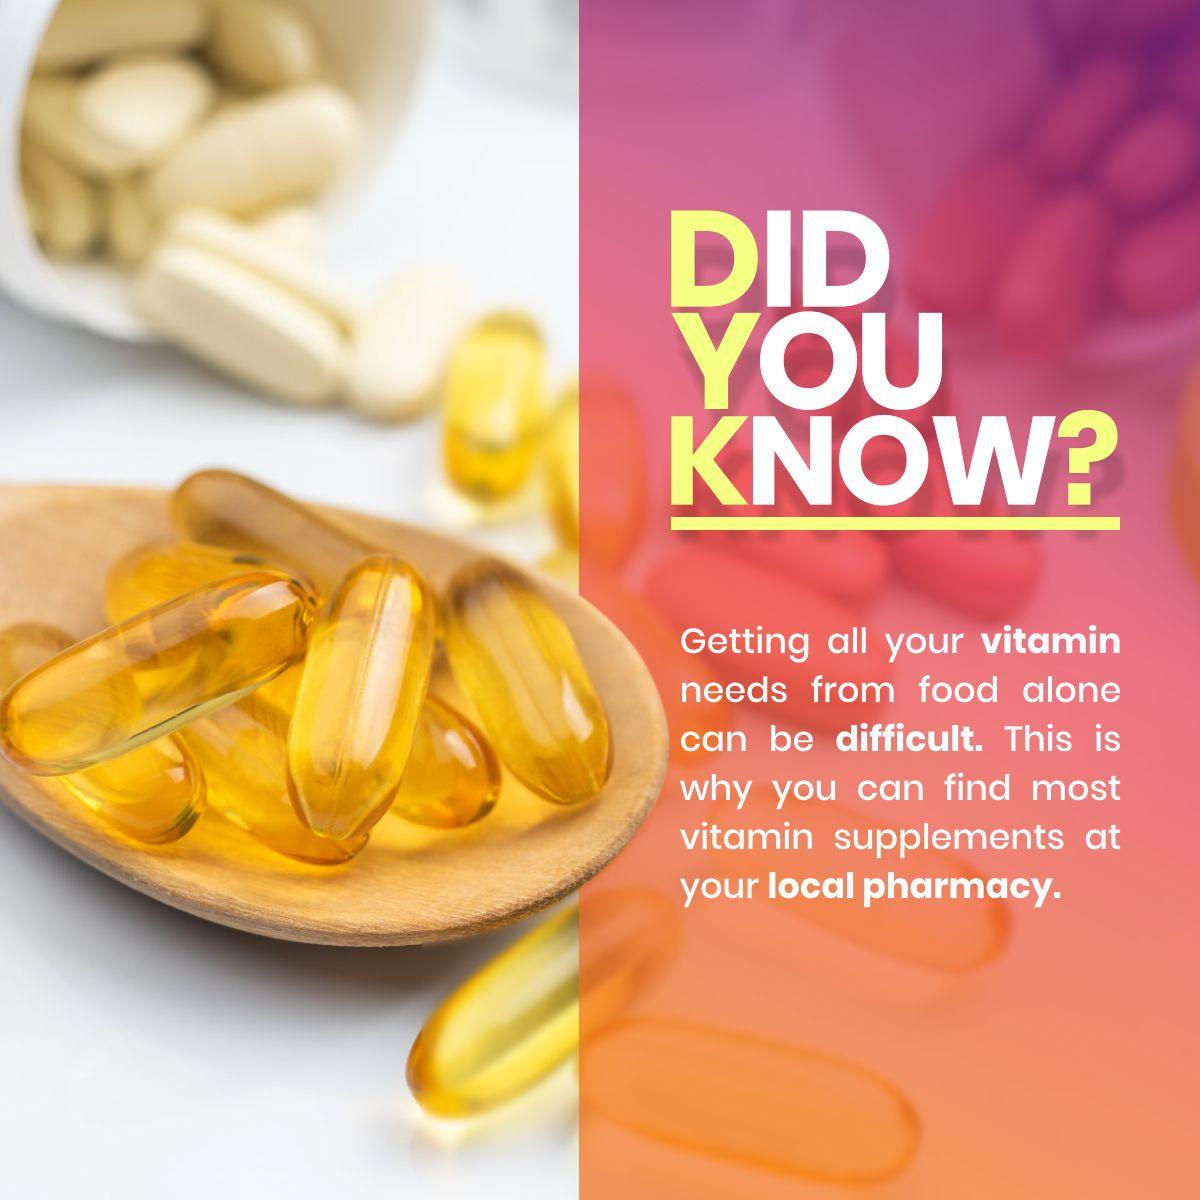 Did You Know? Vitamin SaveNCarePharmacy All vitamins